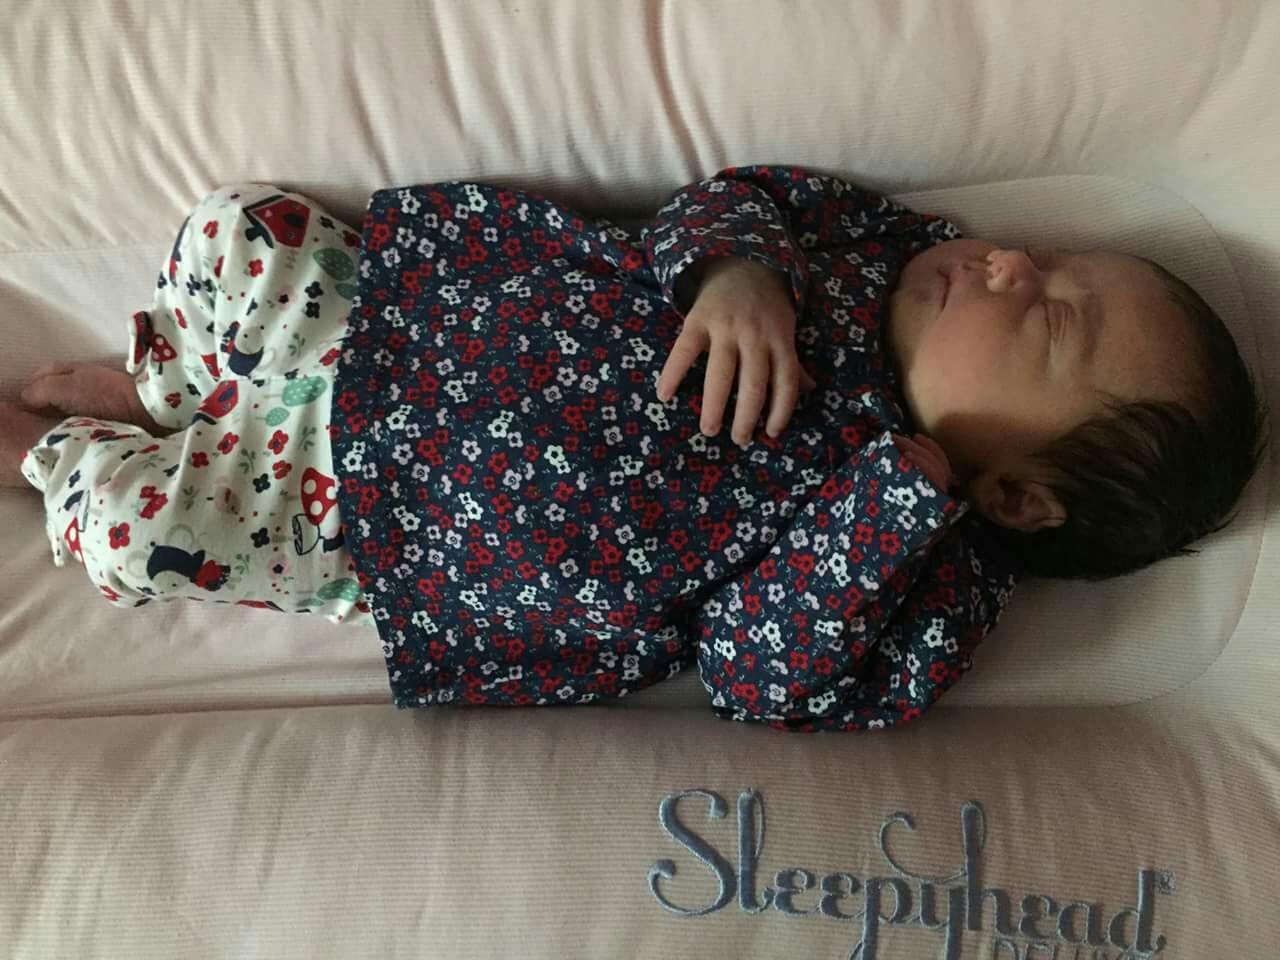 Me Becoming Mum's Newborn Must Haves Sleepyhead Deluxe